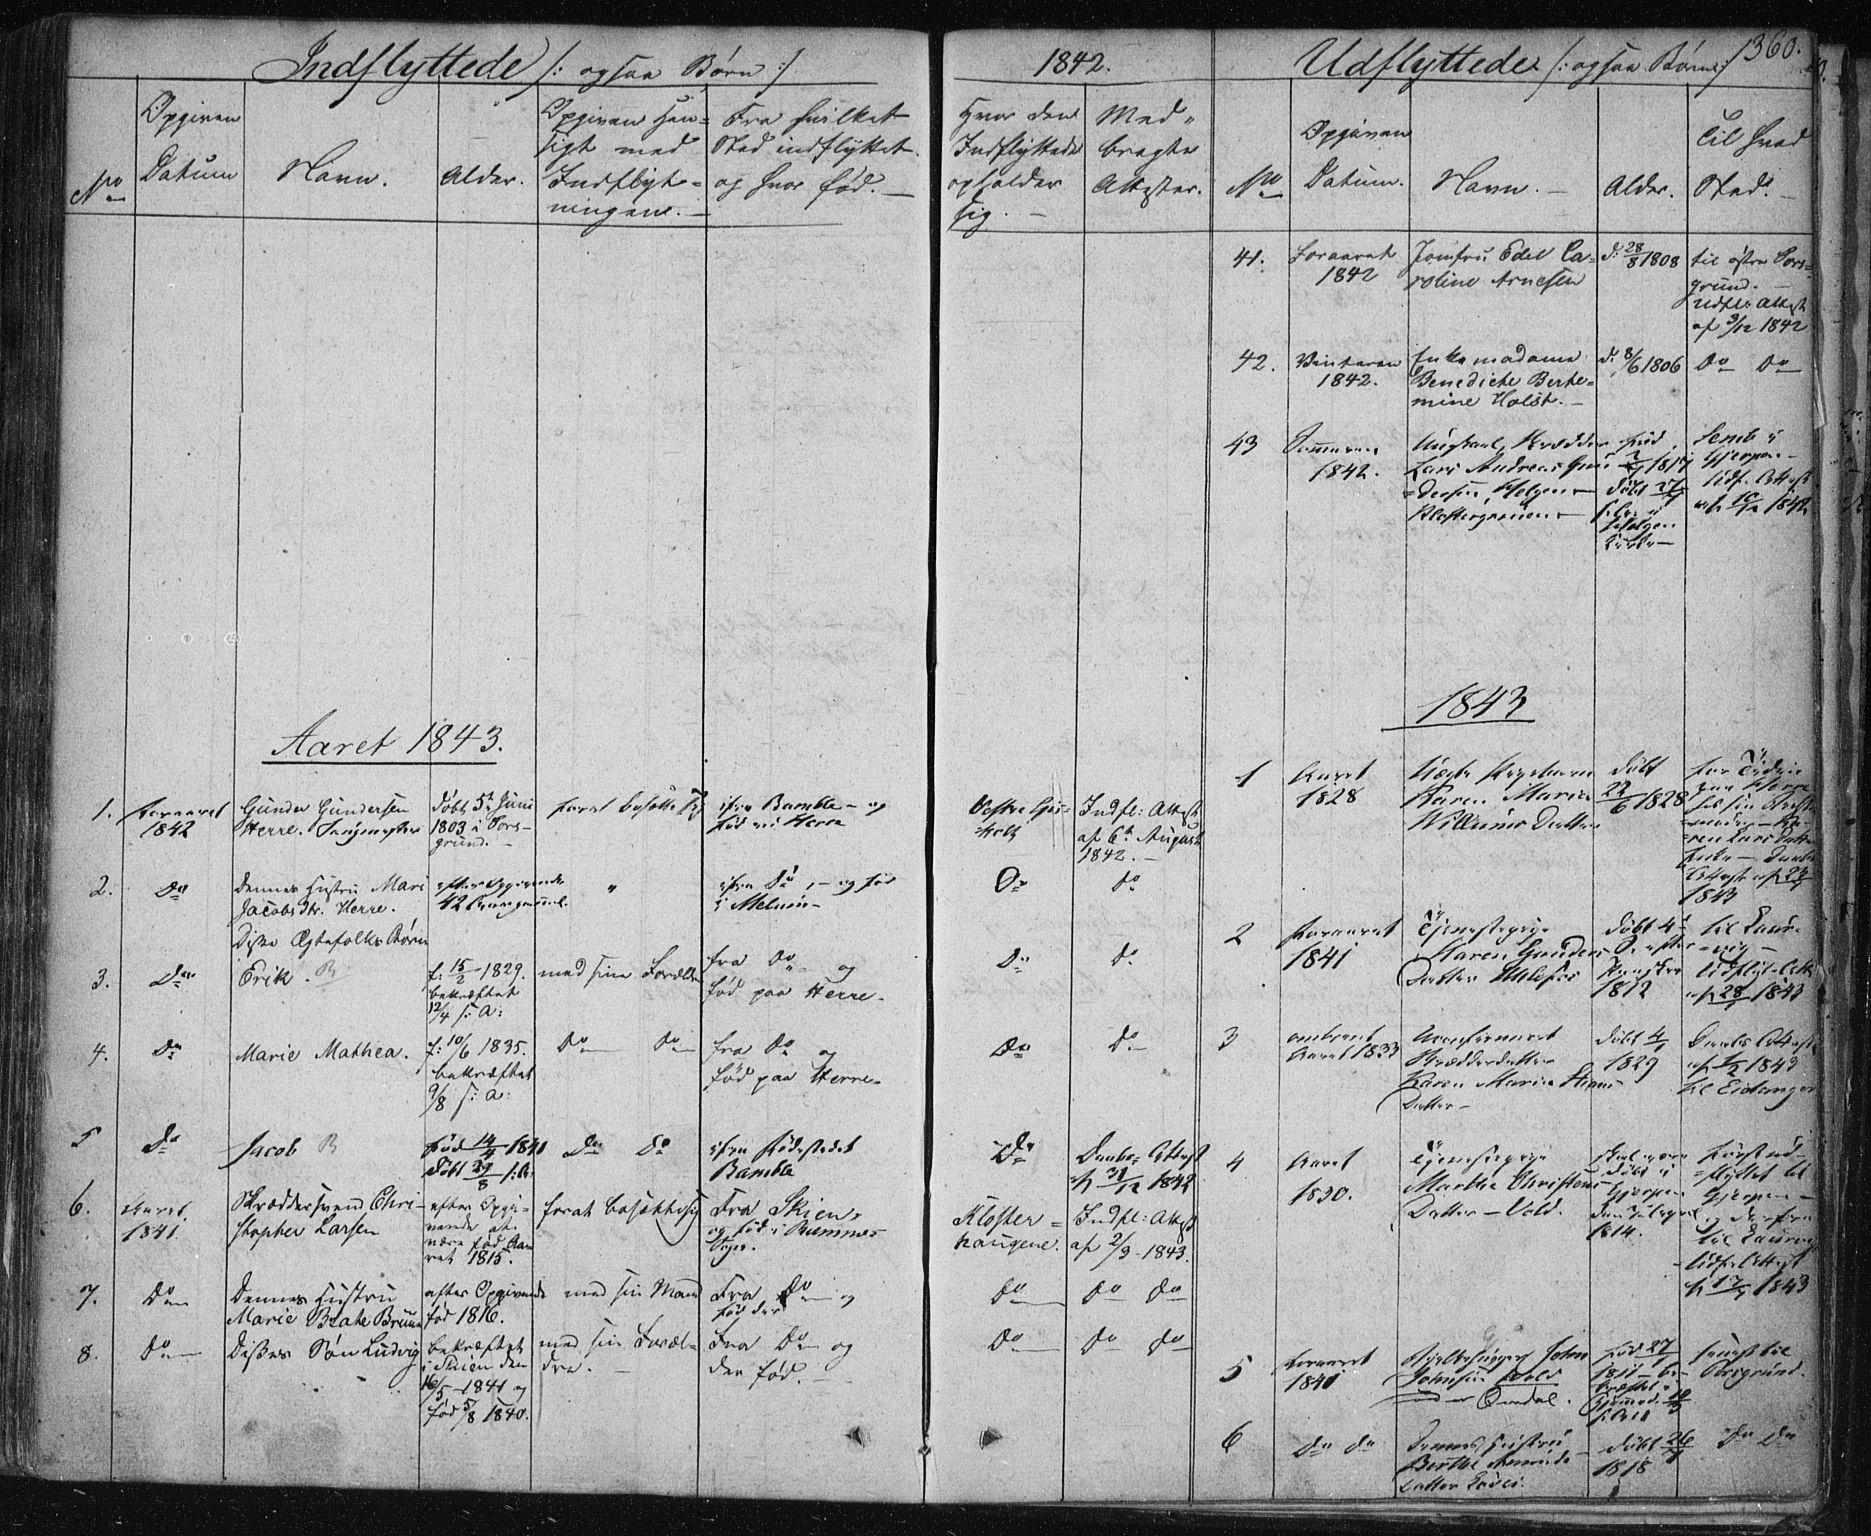 SAKO, Solum kirkebøker, F/Fa/L0005: Ministerialbok nr. I 5, 1833-1843, s. 360